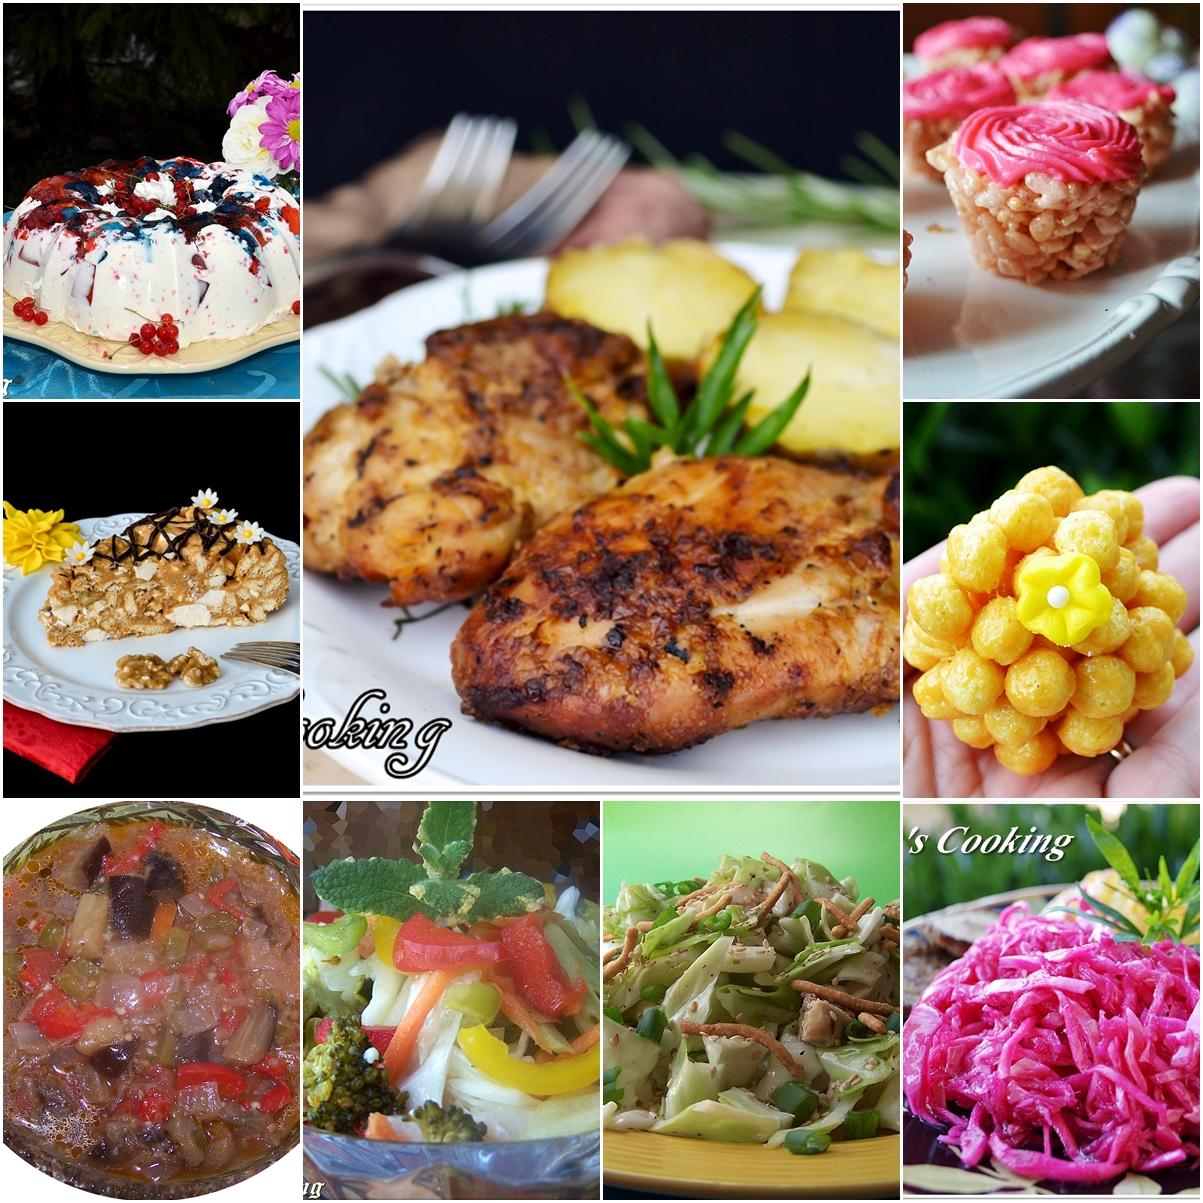 Lea's Cooking: Summer Menu Ideas